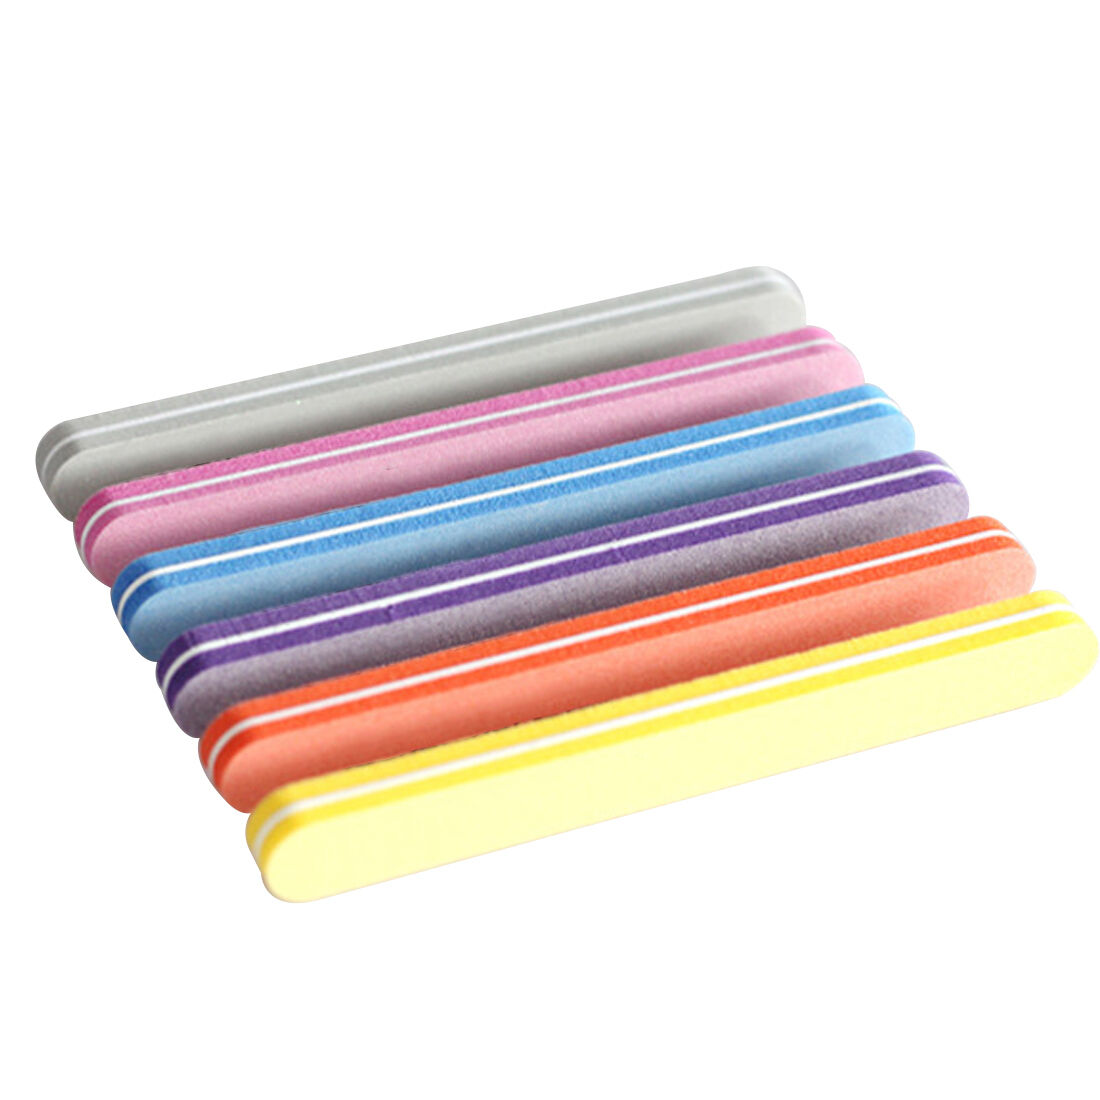 5pcs Nail File Buffer Sanding Washable Manicure Tool Nail Art Polish ...